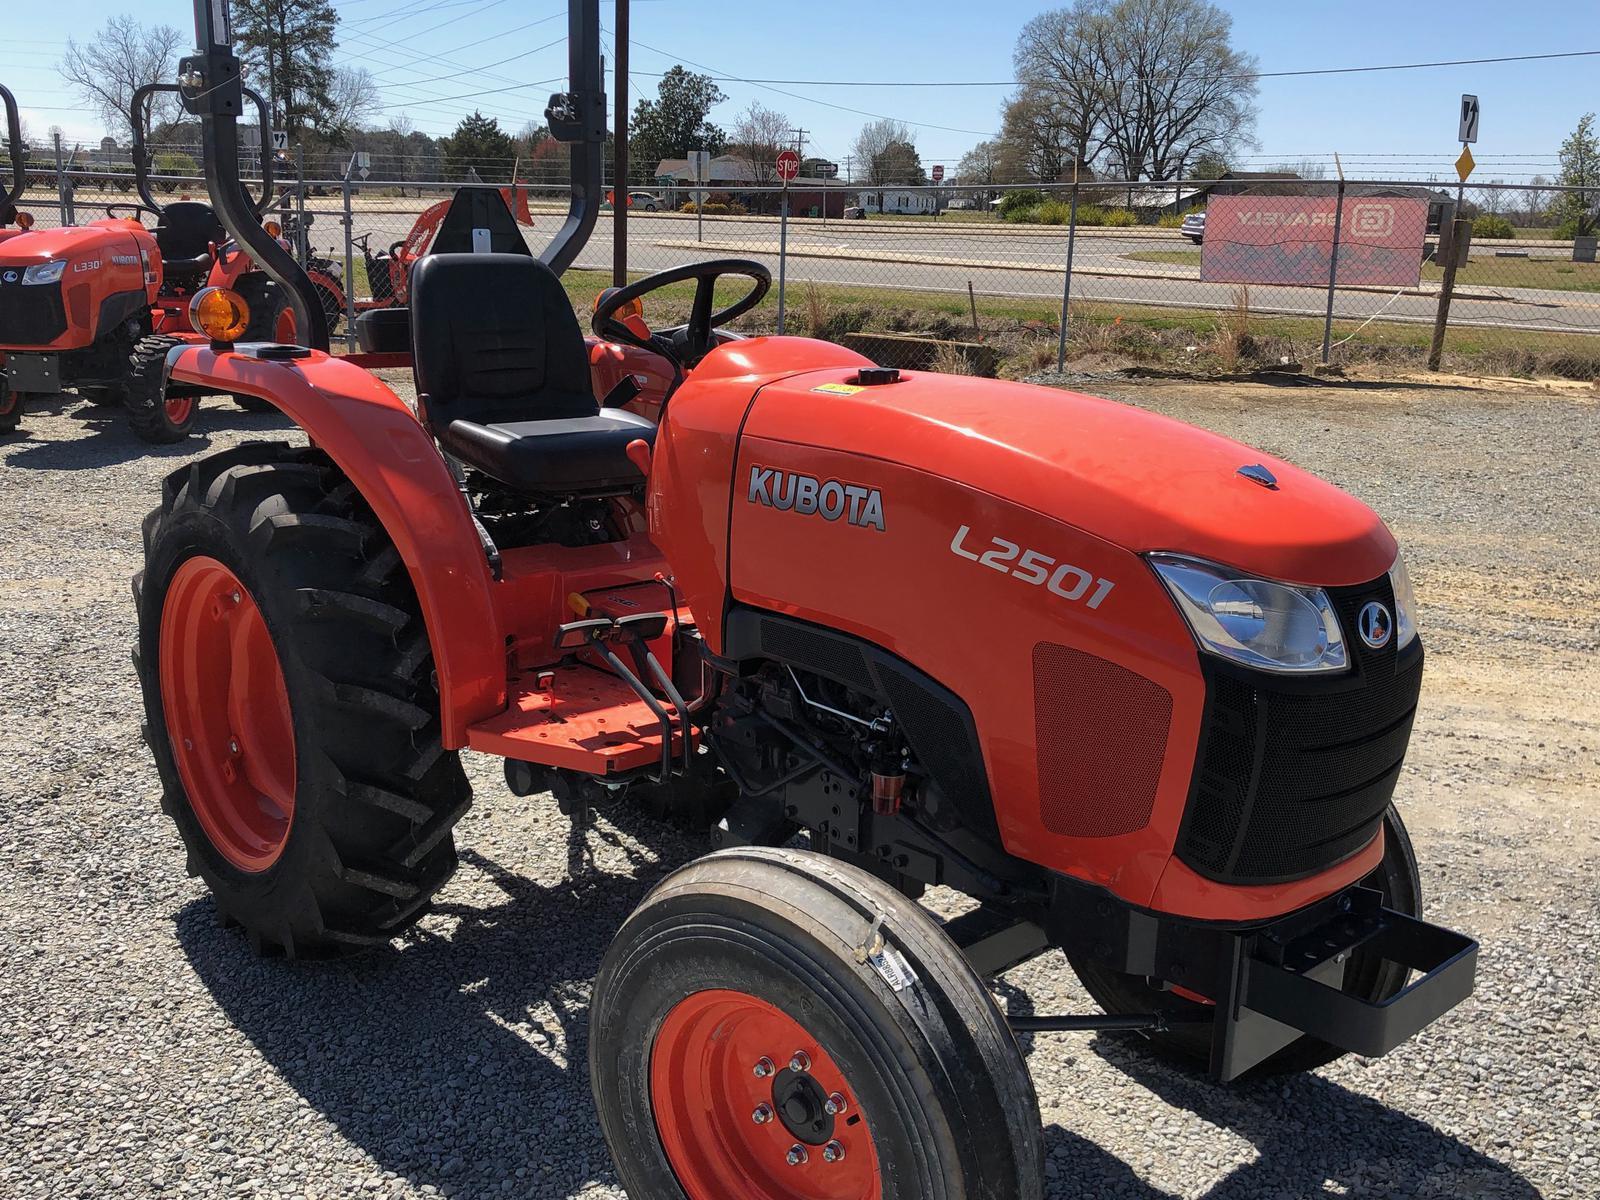 2019 Kubota L2501 Gear 2WD for sale in Goldsboro, NC